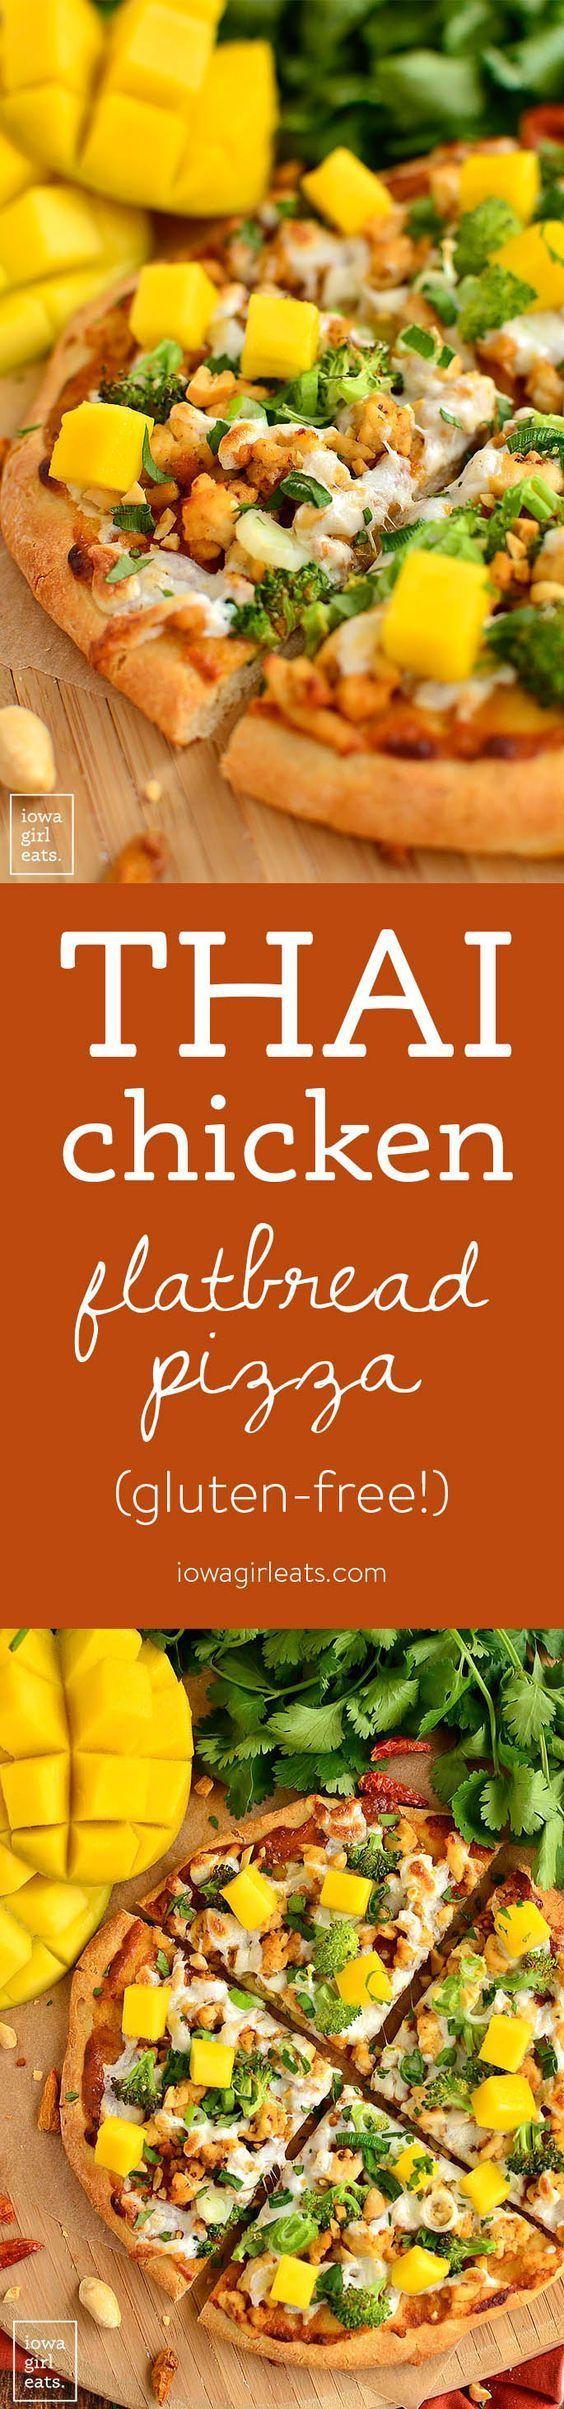 Switch up pizza night with gluten-free Thai Chicken Flatbread Pizza featuring savory peanut sauce, fresh herbs, and sweet mango.   iowagirleats.com